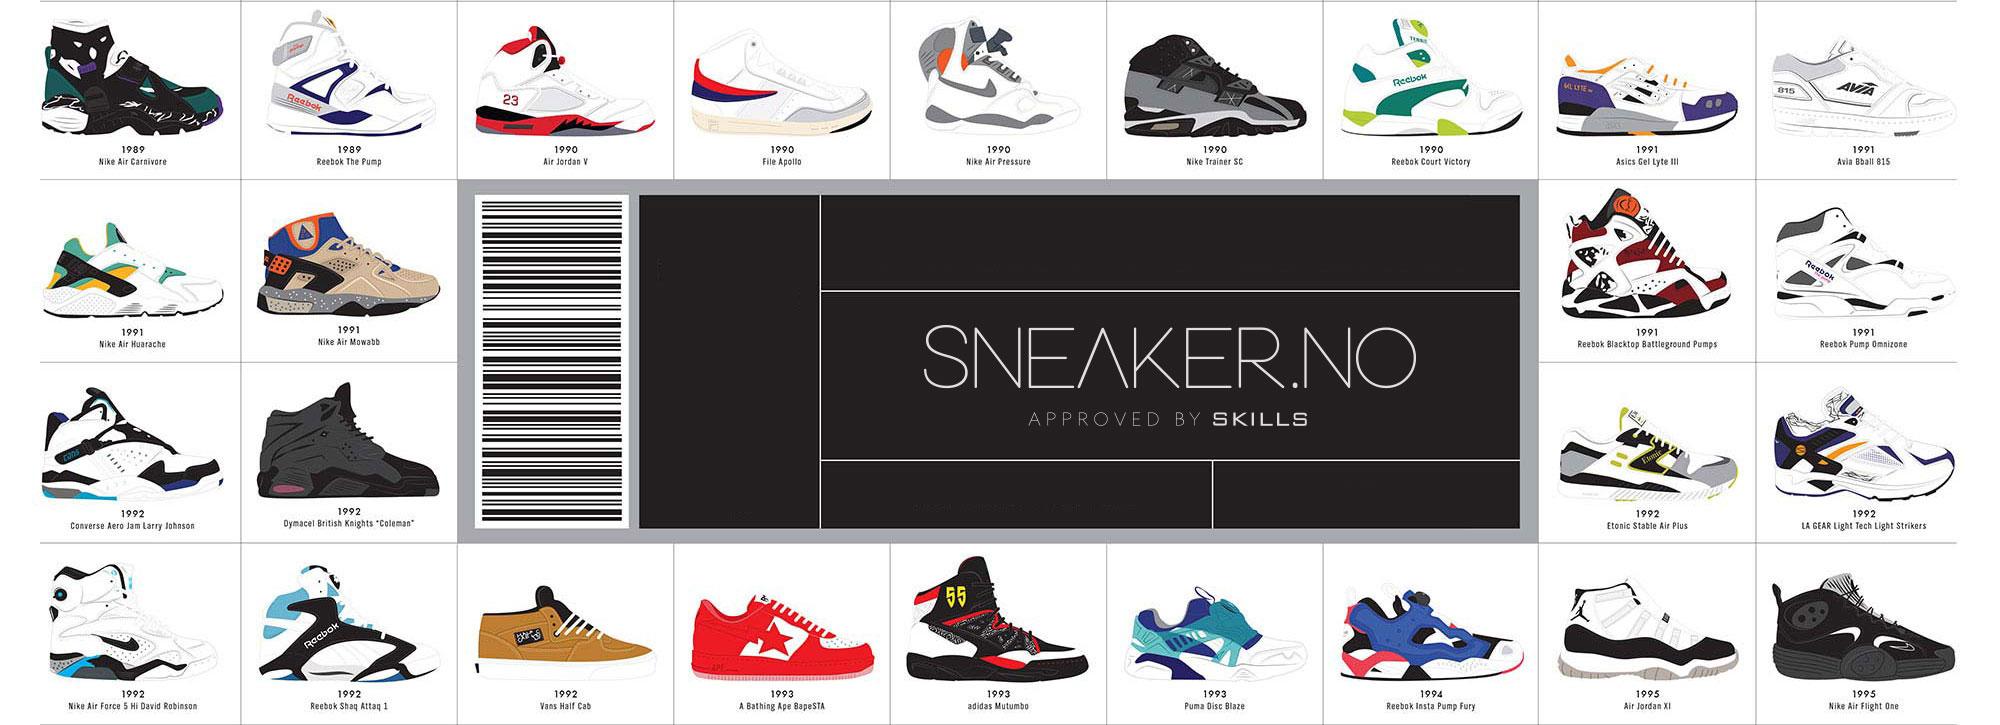 adidas basketball sko history